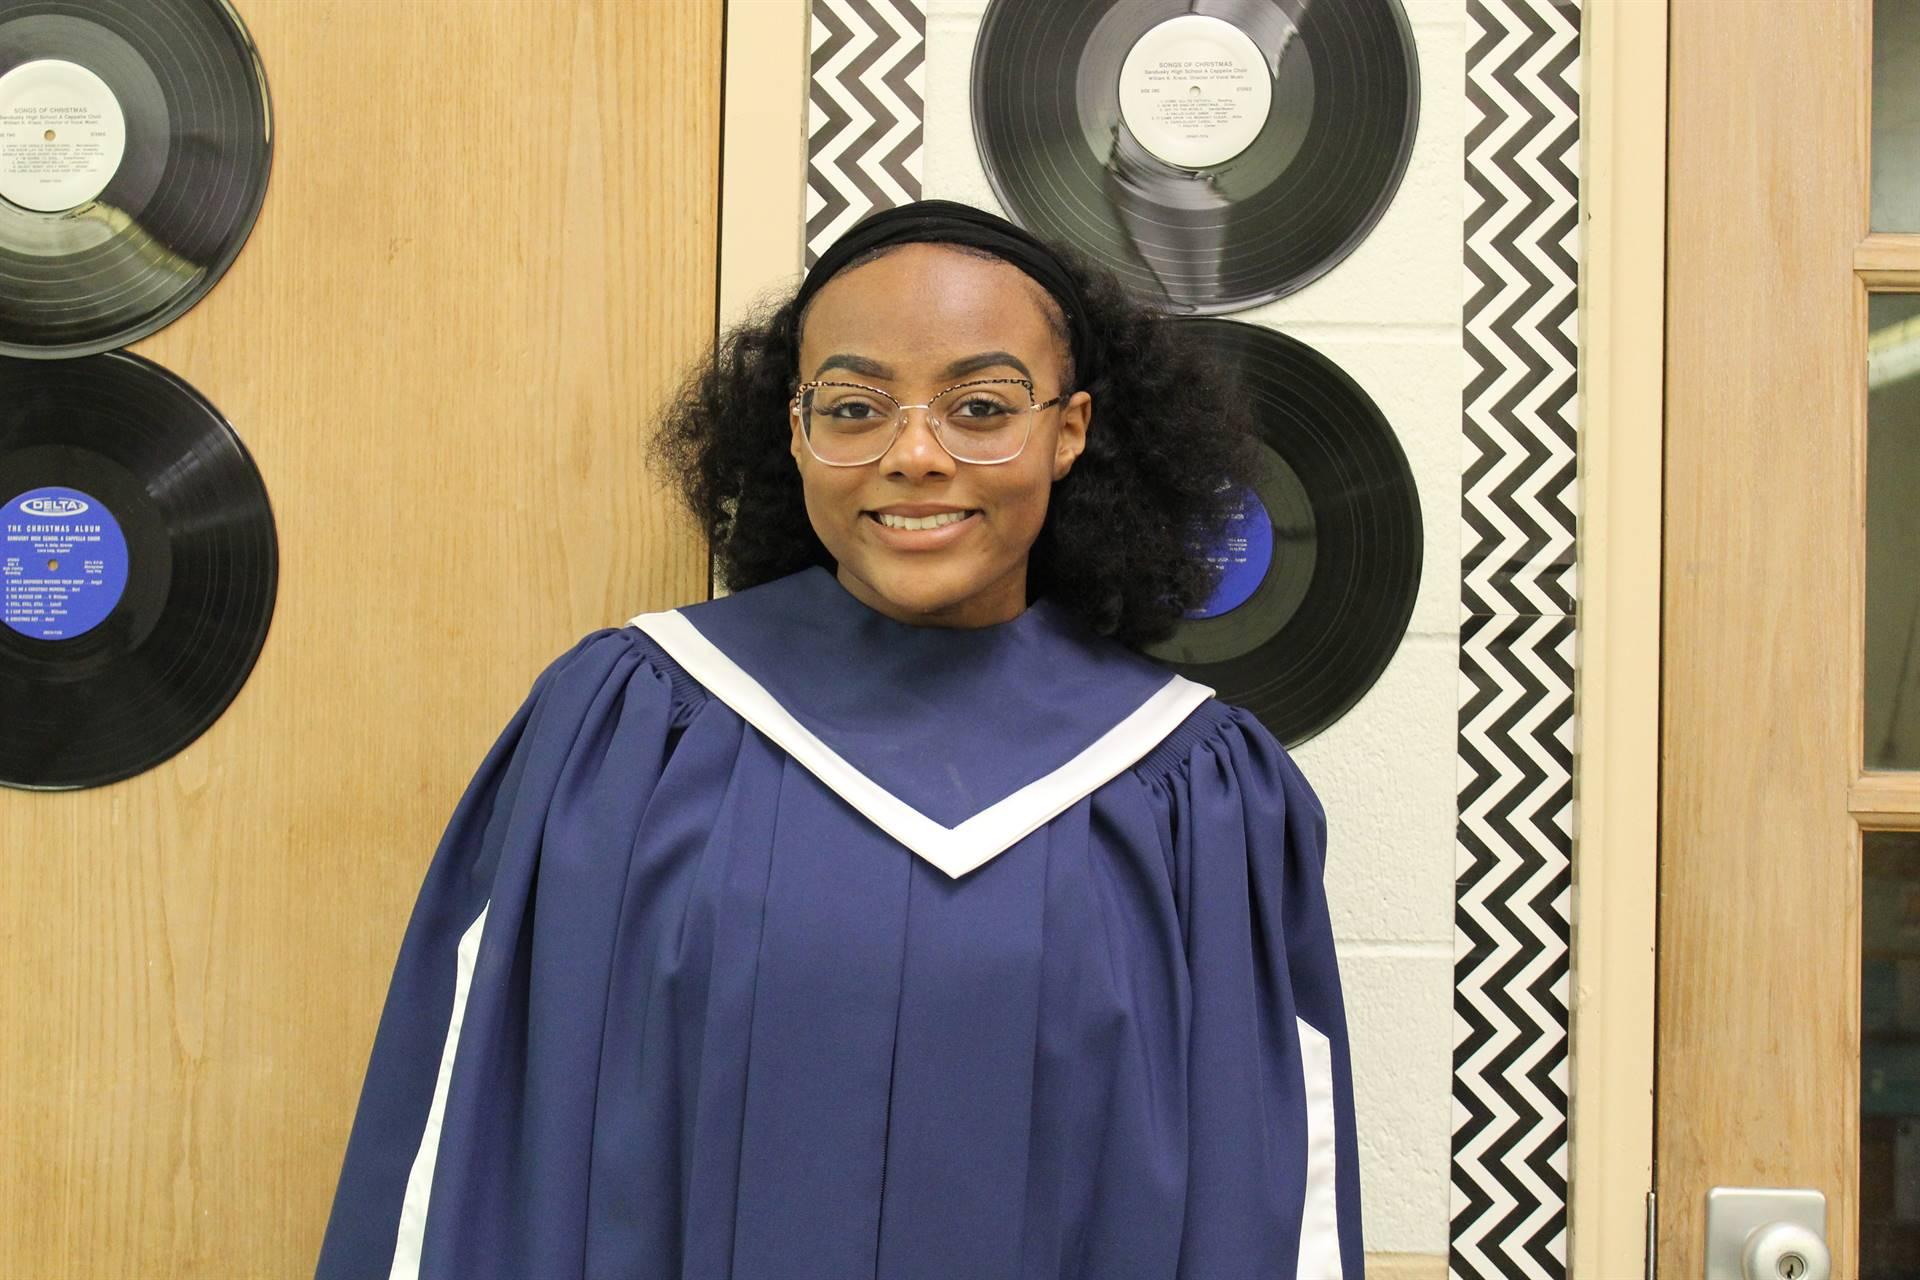 Student in Choir Robe